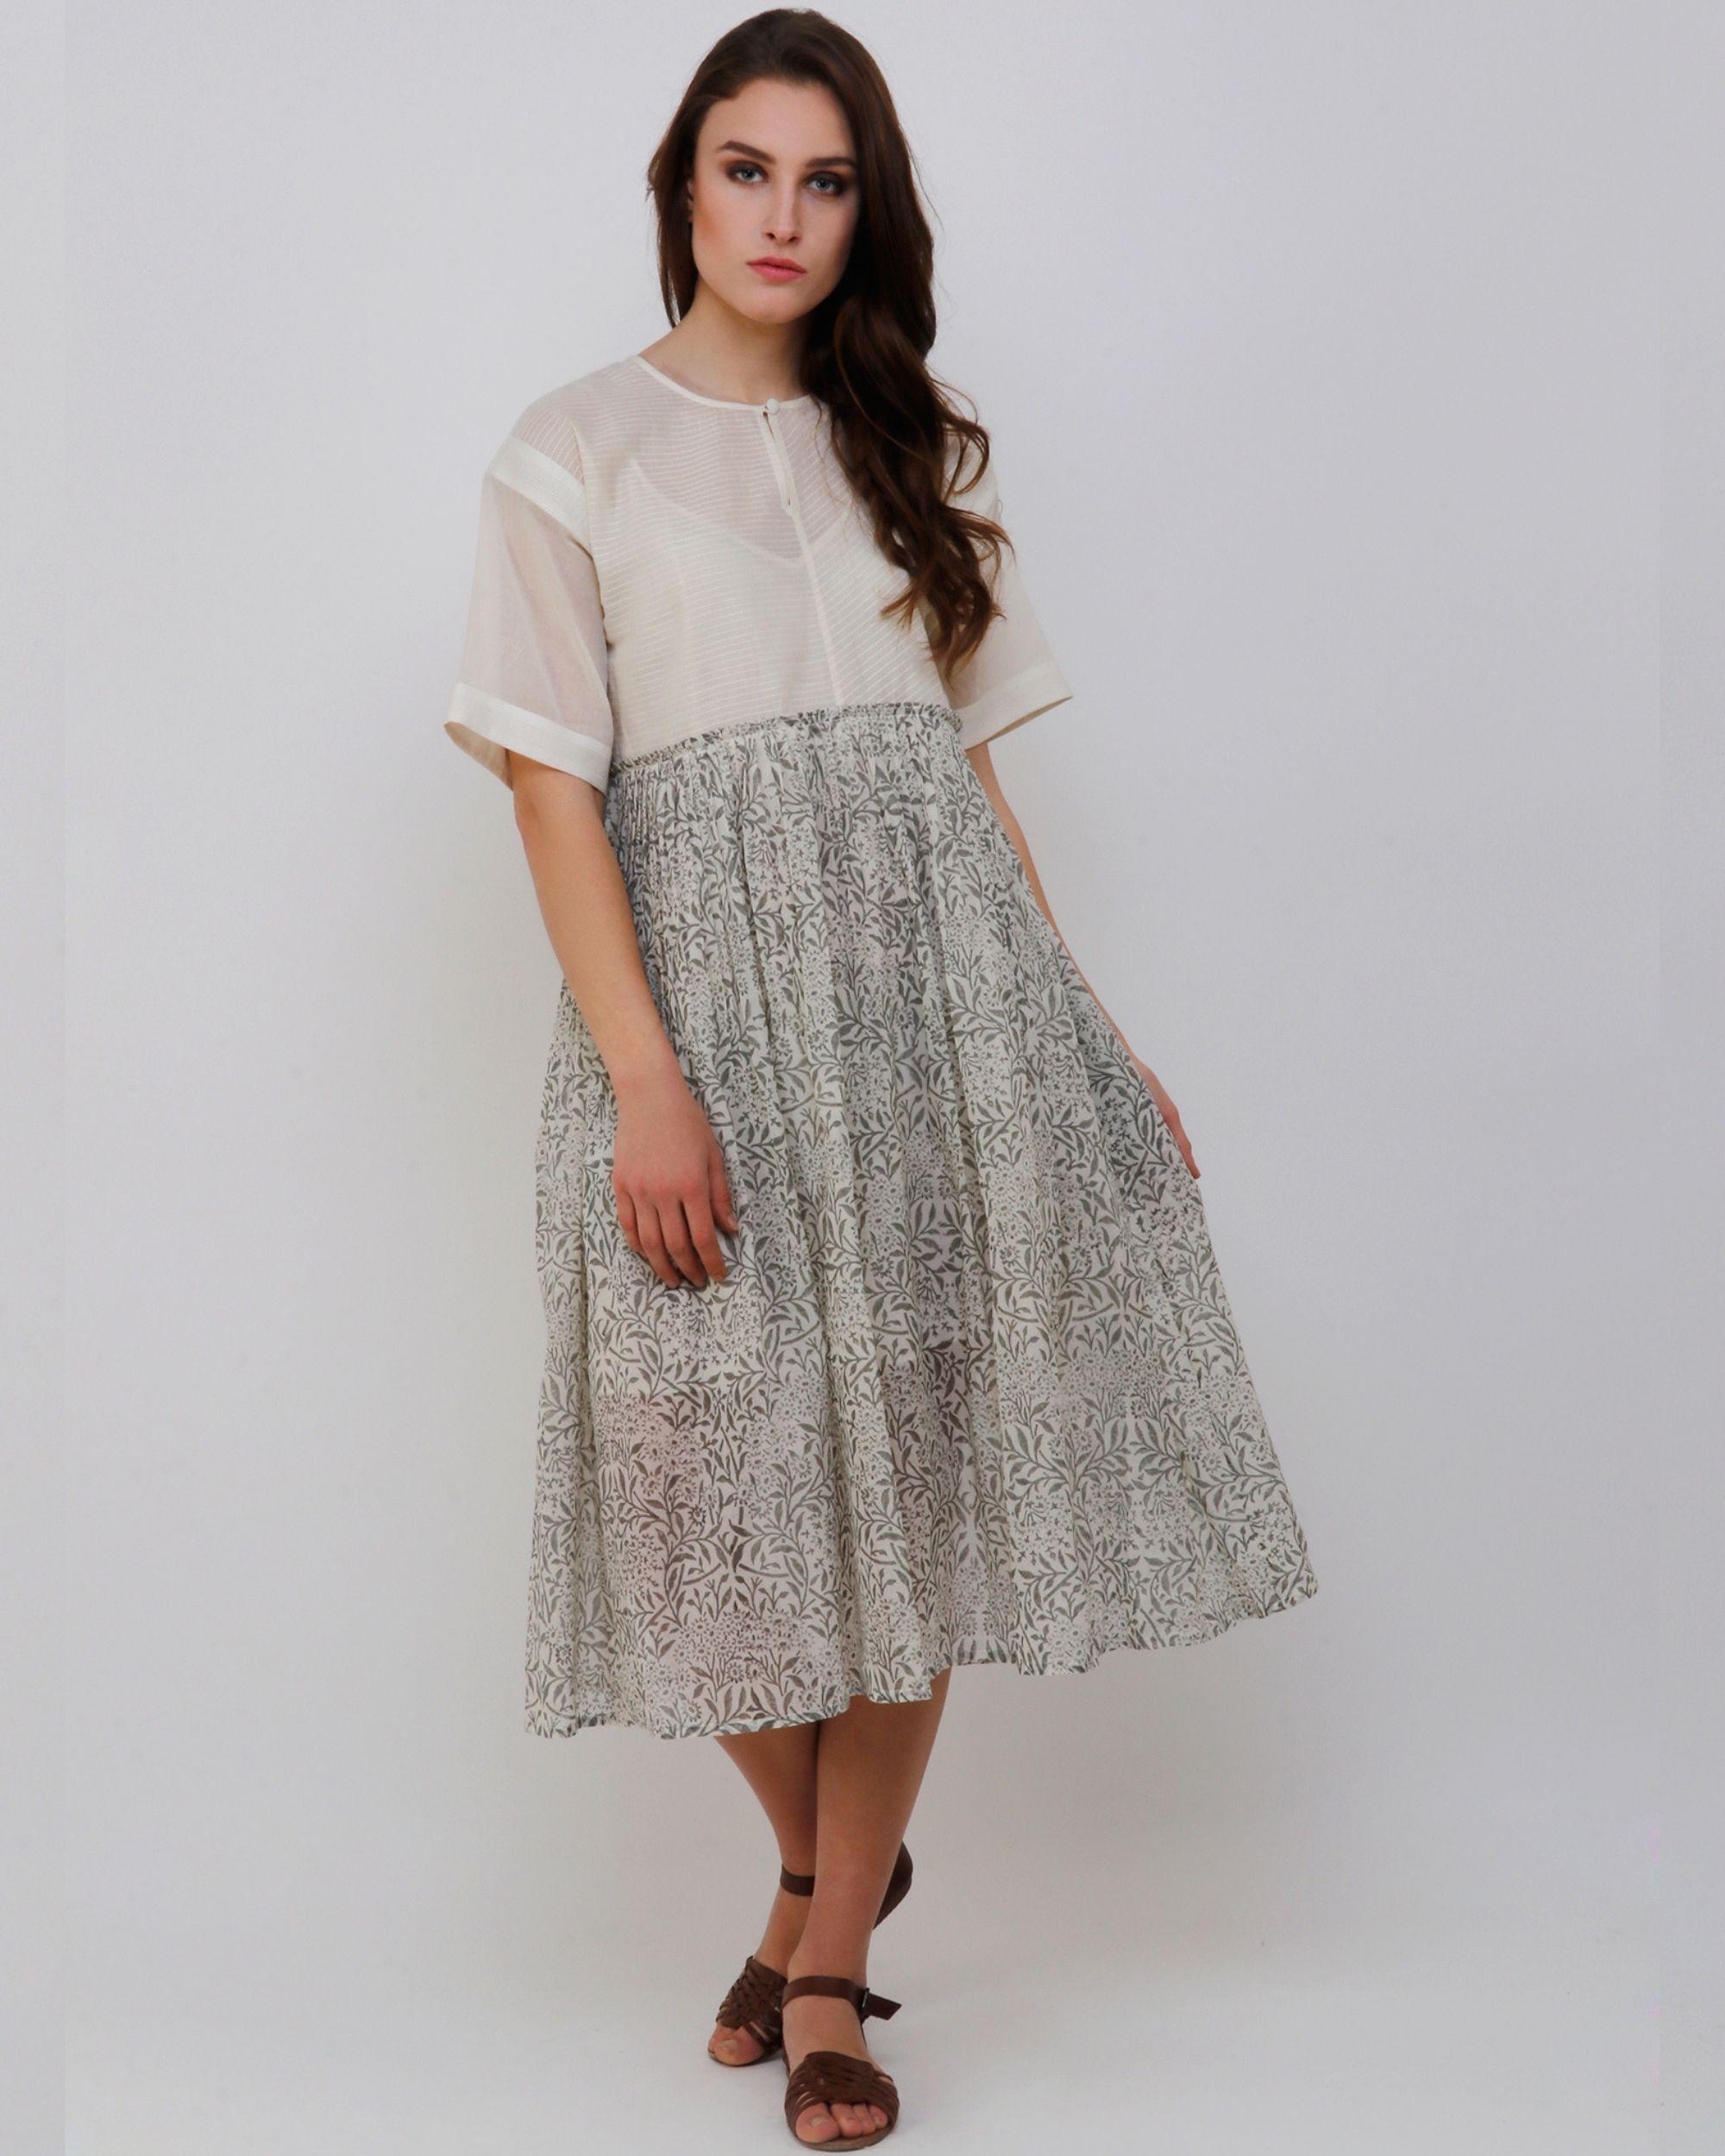 Handblock printed grey dress